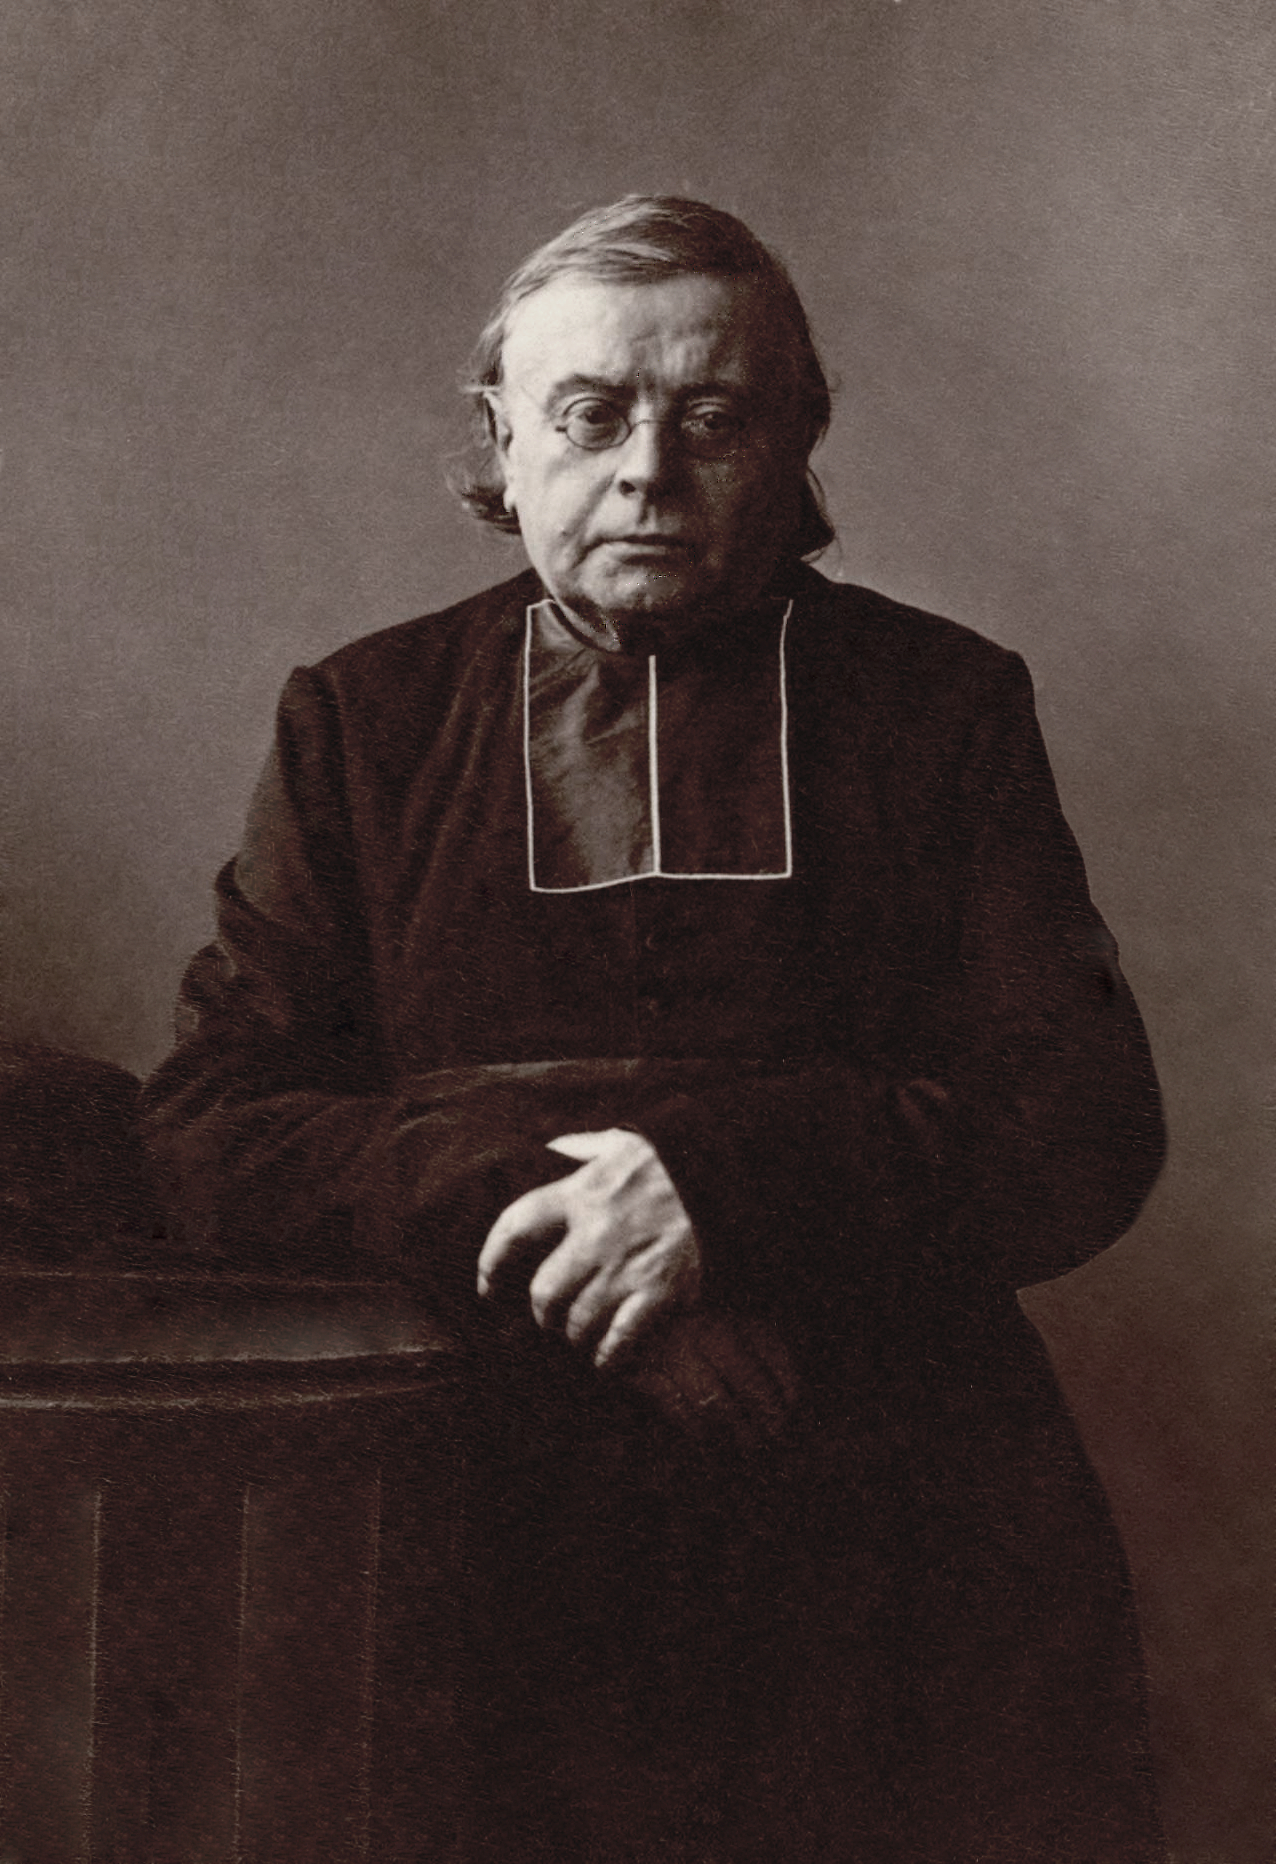 Image of François-Napoléon-Marie Moigno from Wikidata